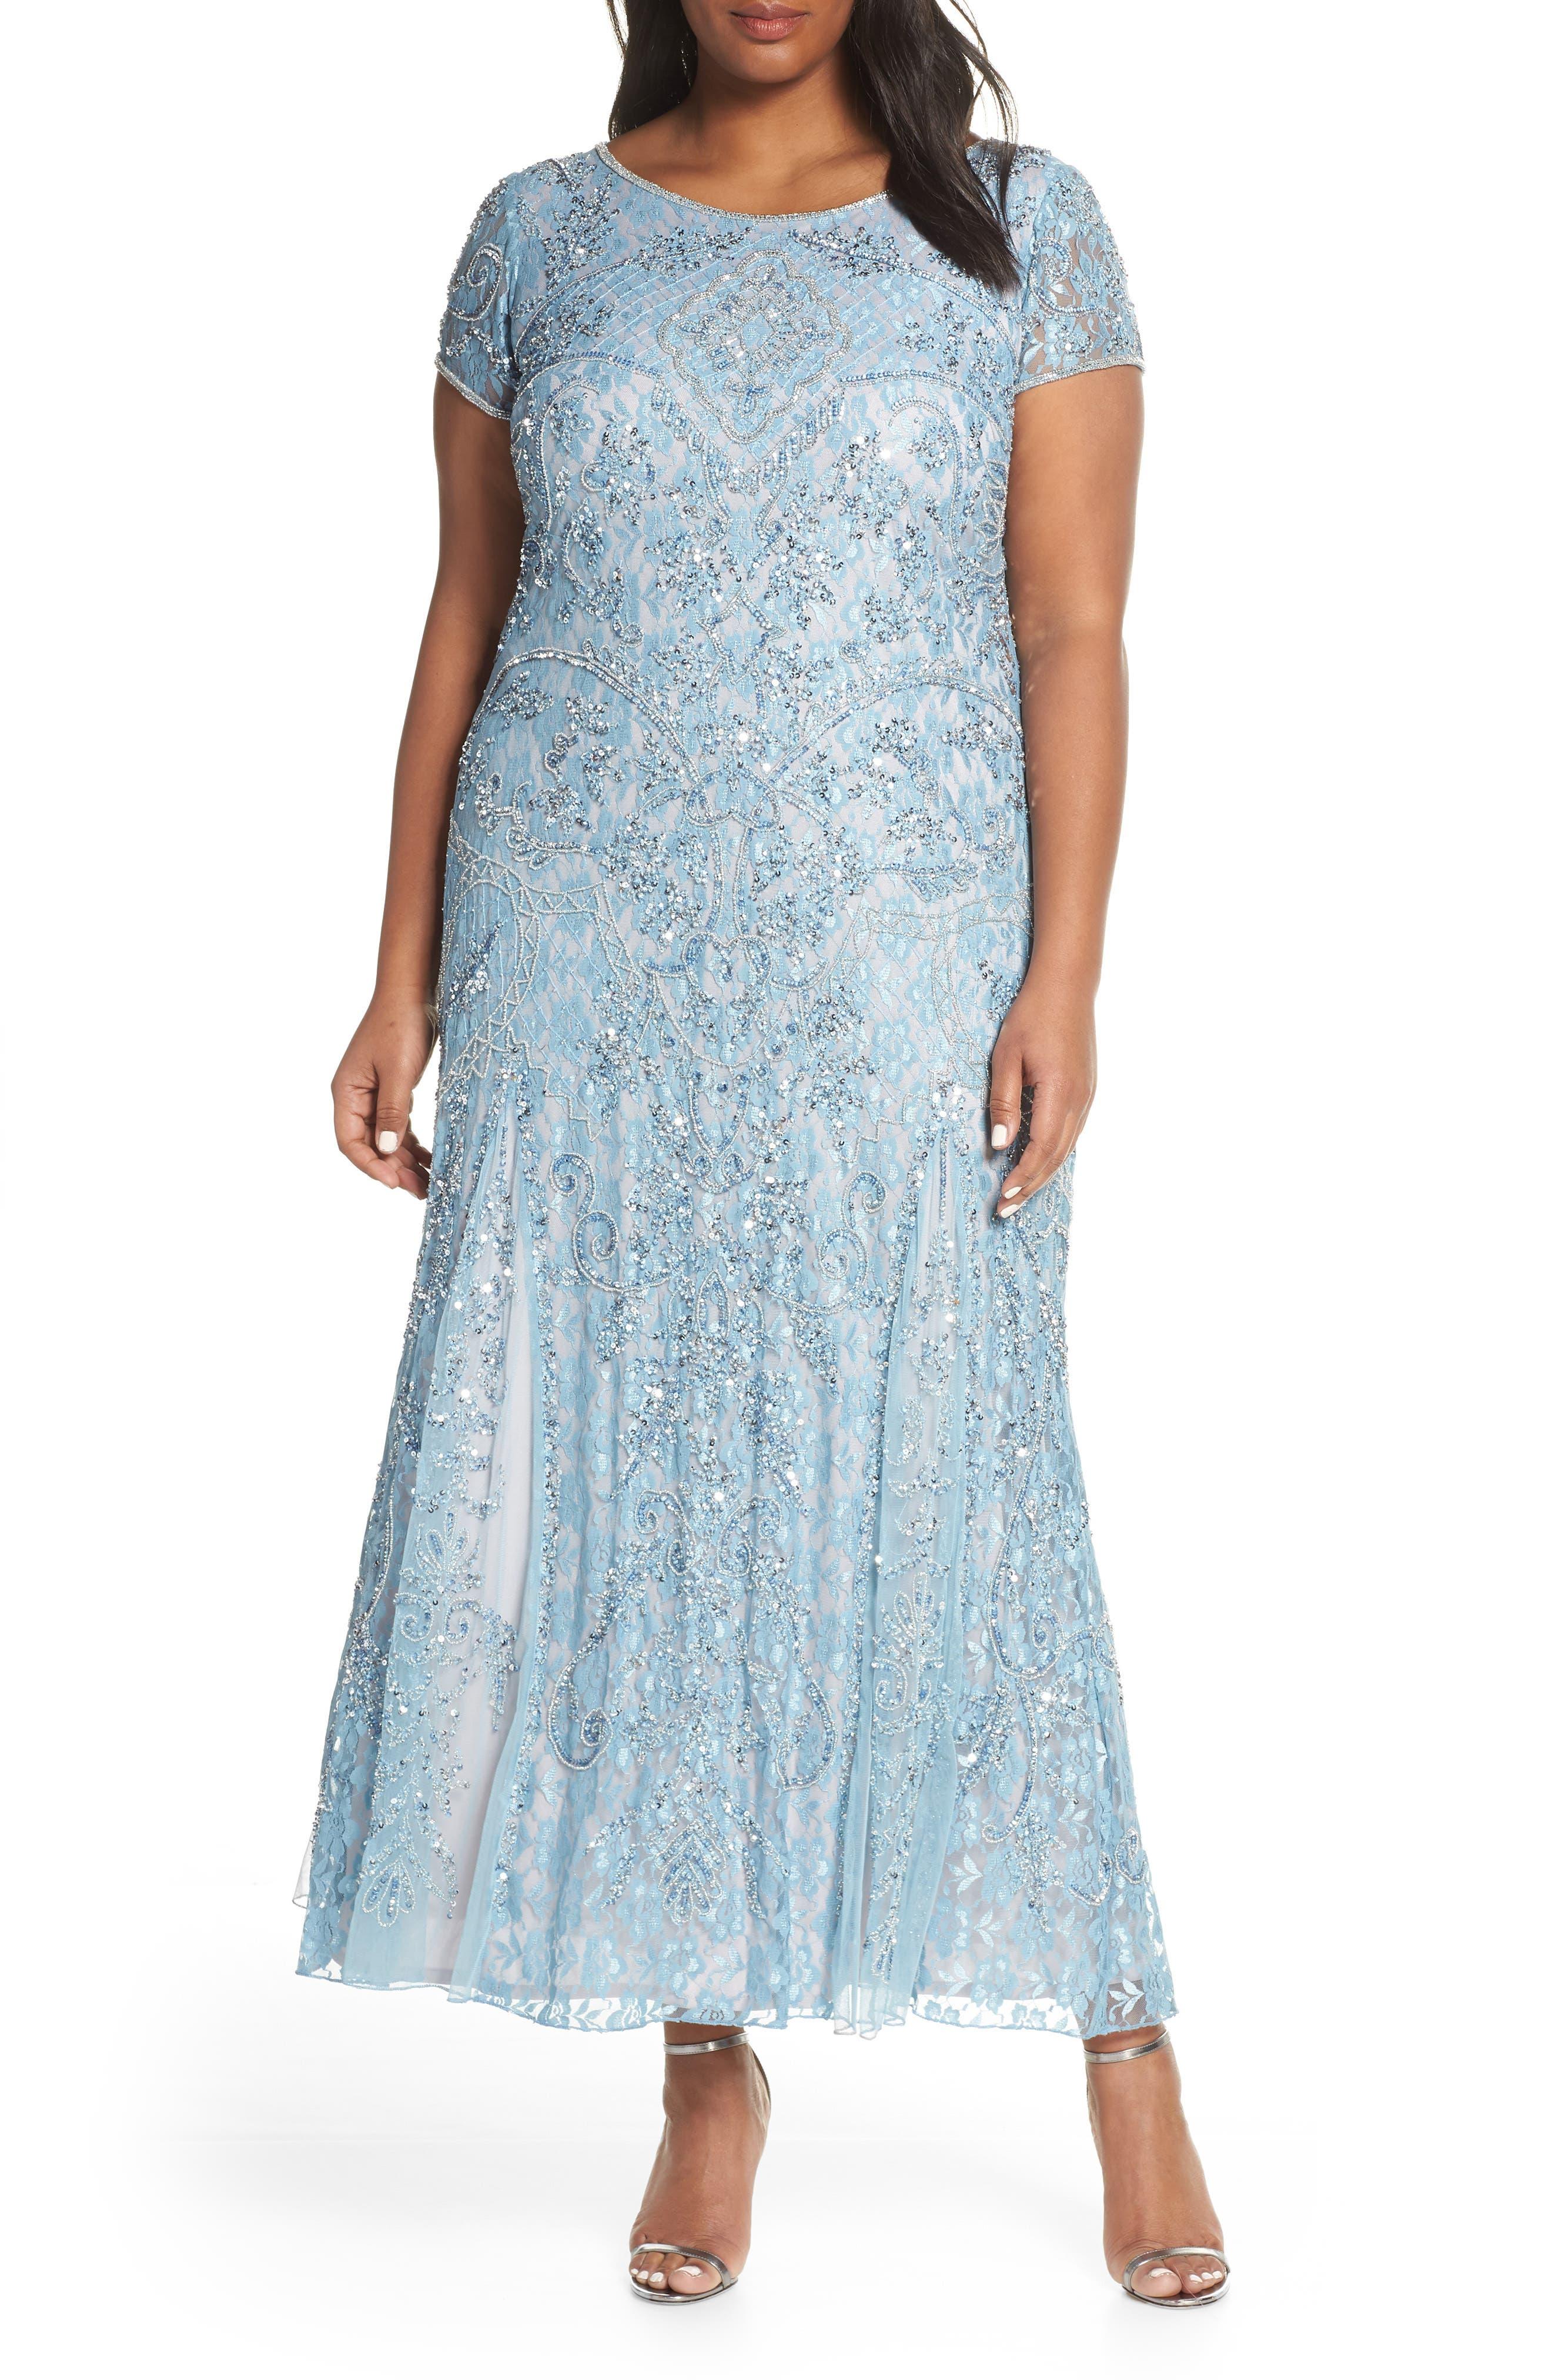 1920s Downton Abbey Dresses Plus Size Womens Pisarro Nights Embellished Lace A-Line Dress Size 24W - Blue $238.00 AT vintagedancer.com